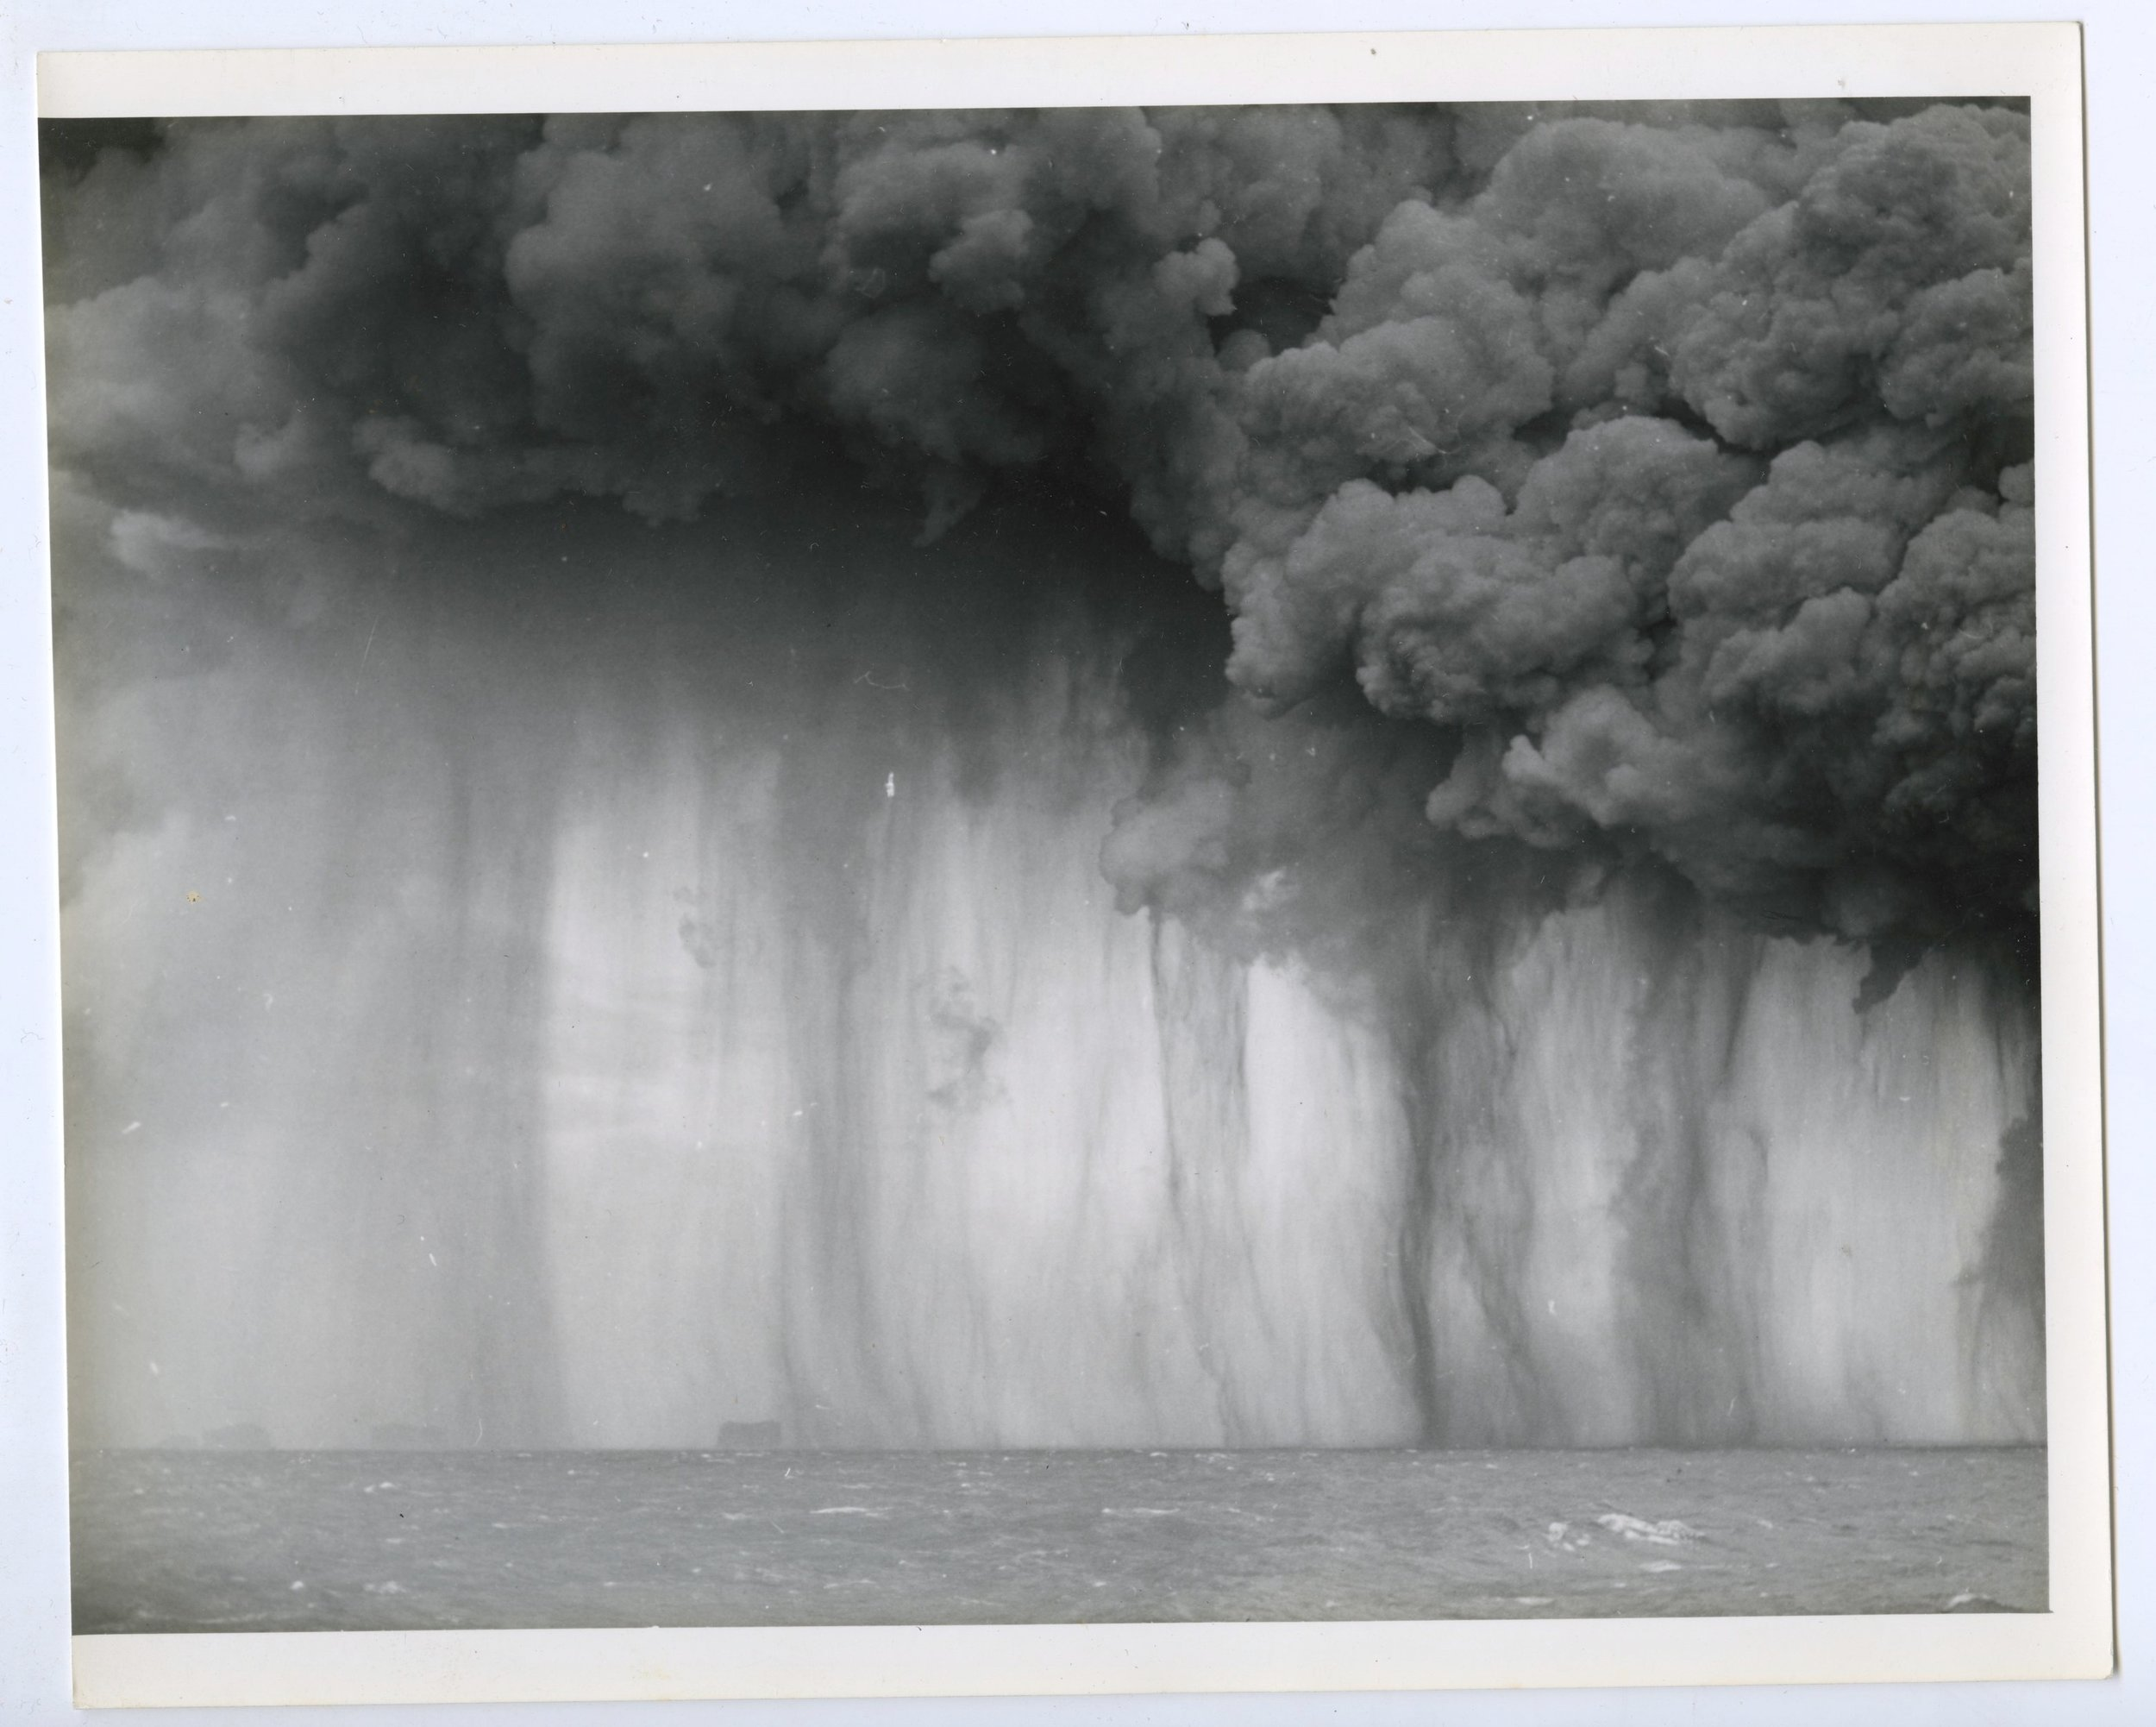 stursay eruption photog swimming chp 8 subaqueous  6.jpeg